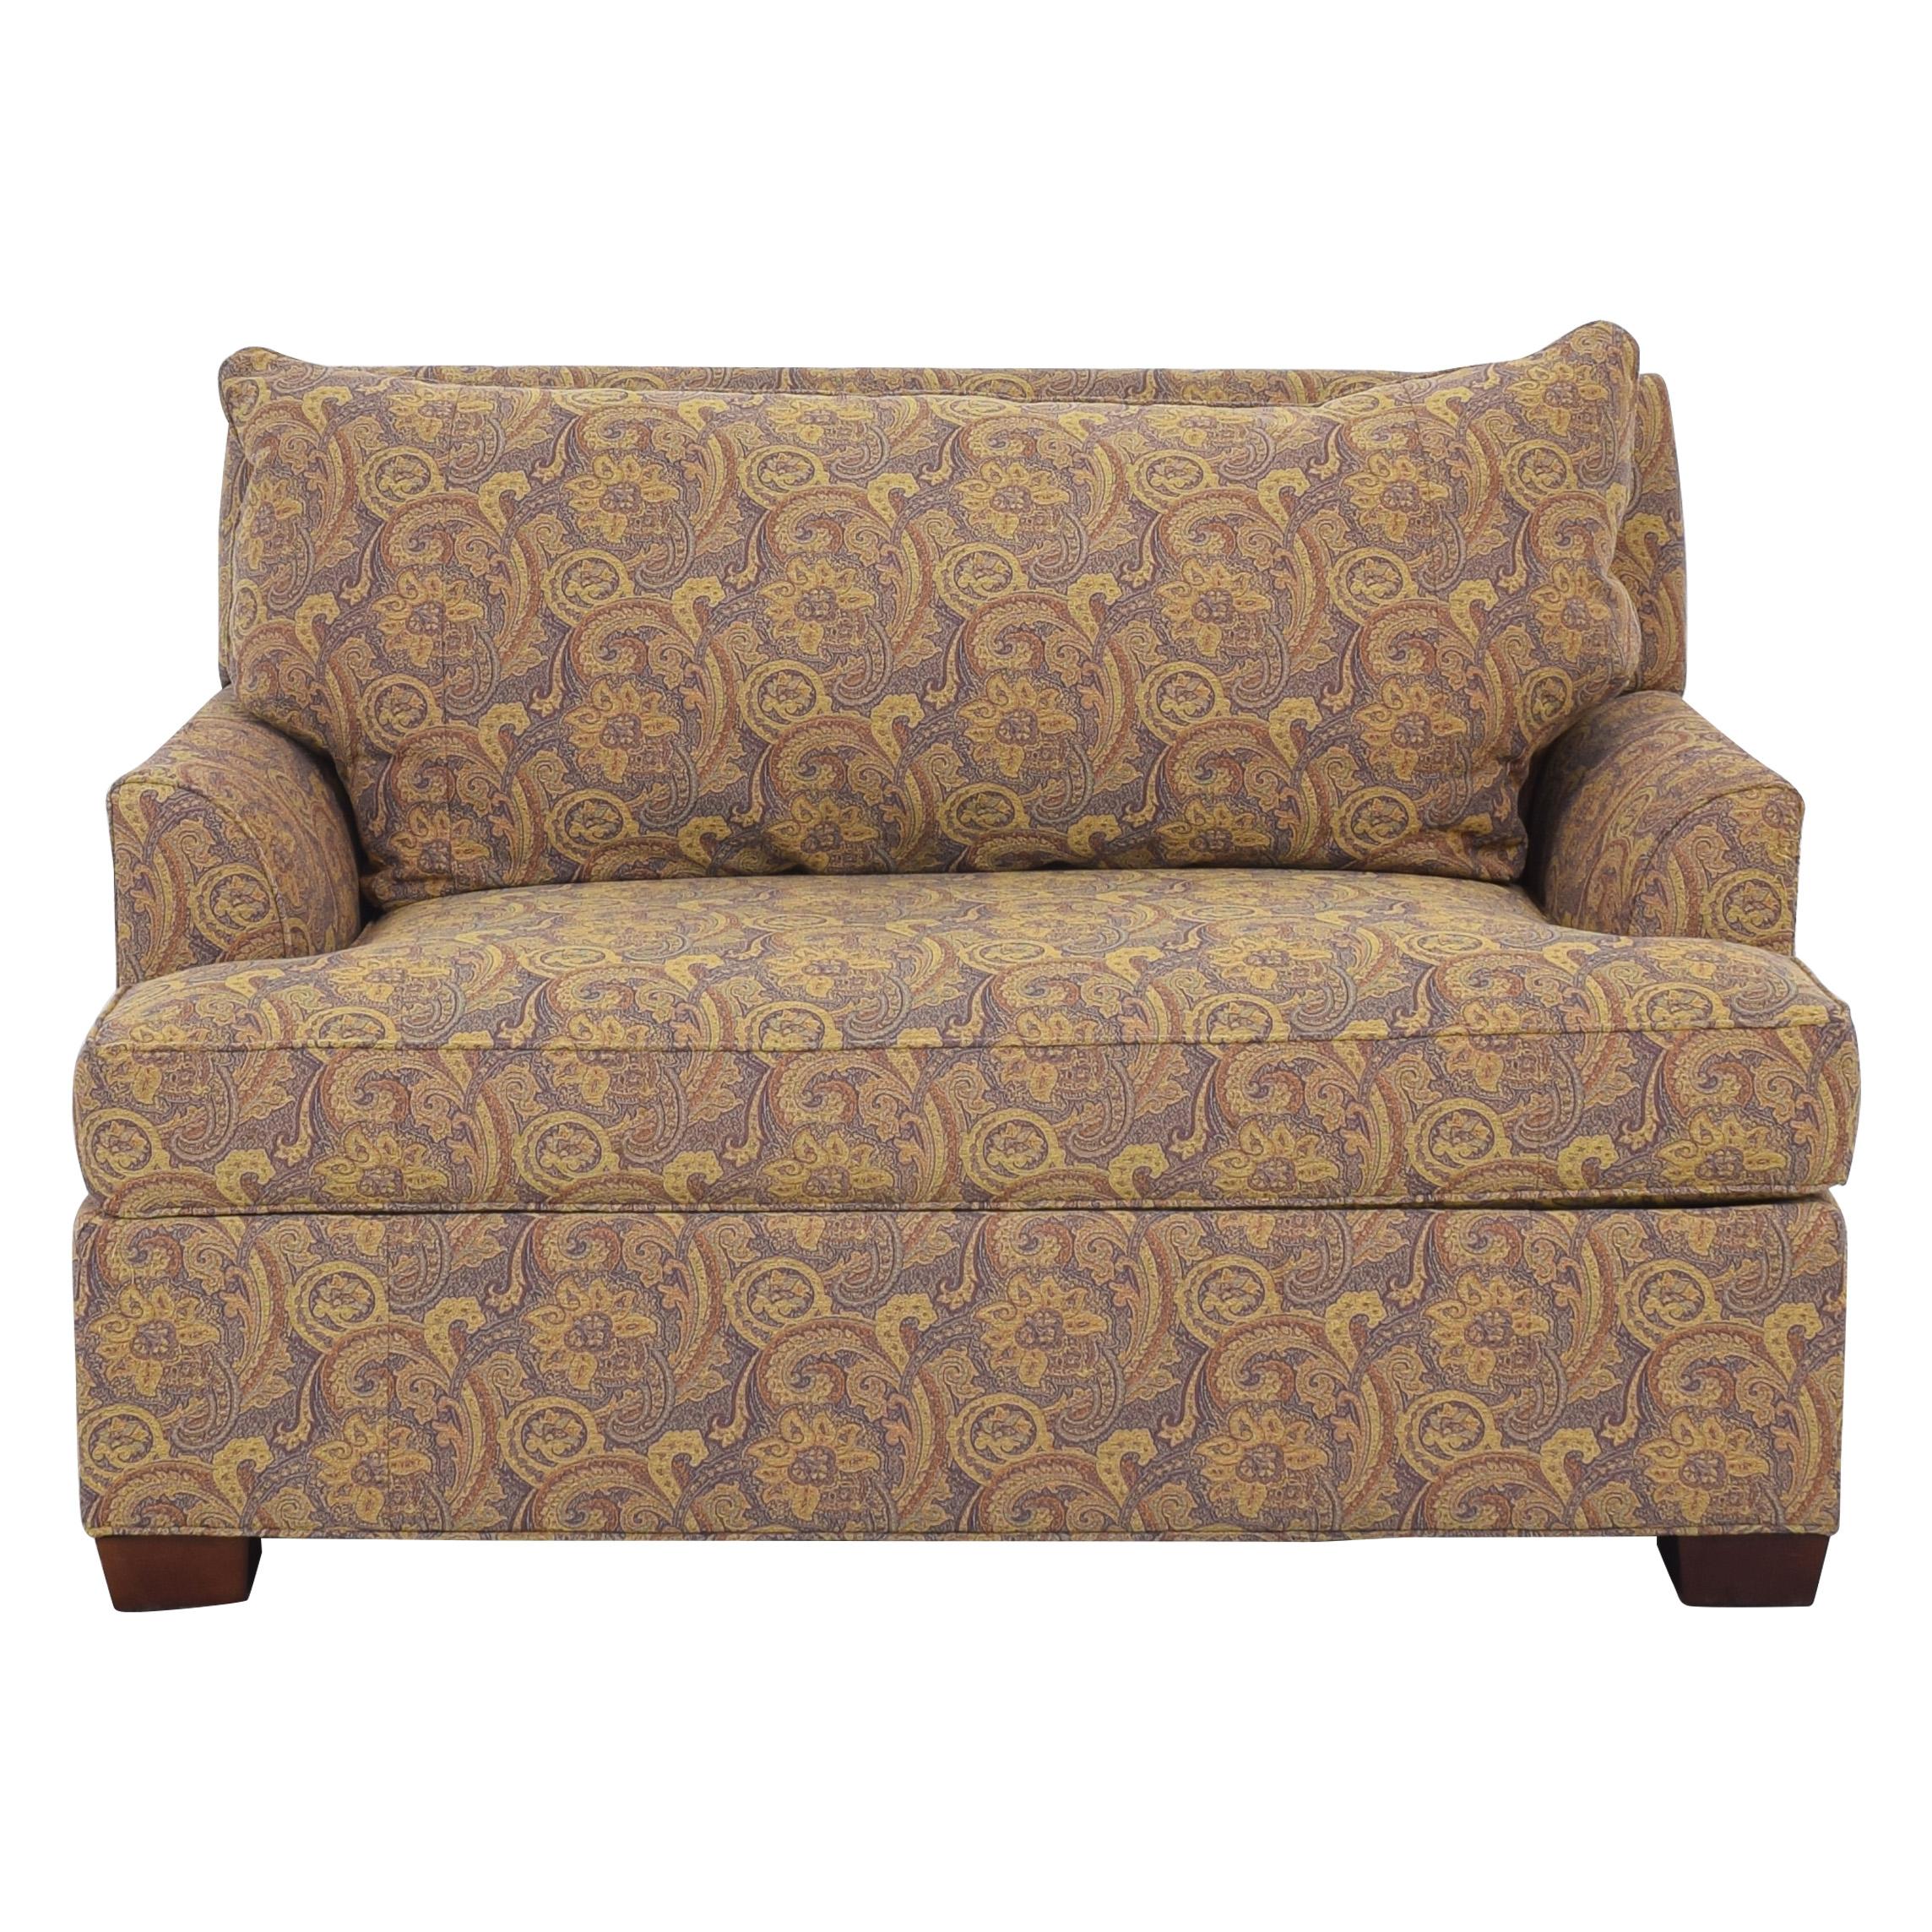 Ethan Allen Ethan Allen Marina Chair and a Half Twin Sleeper with Ottoman on sale